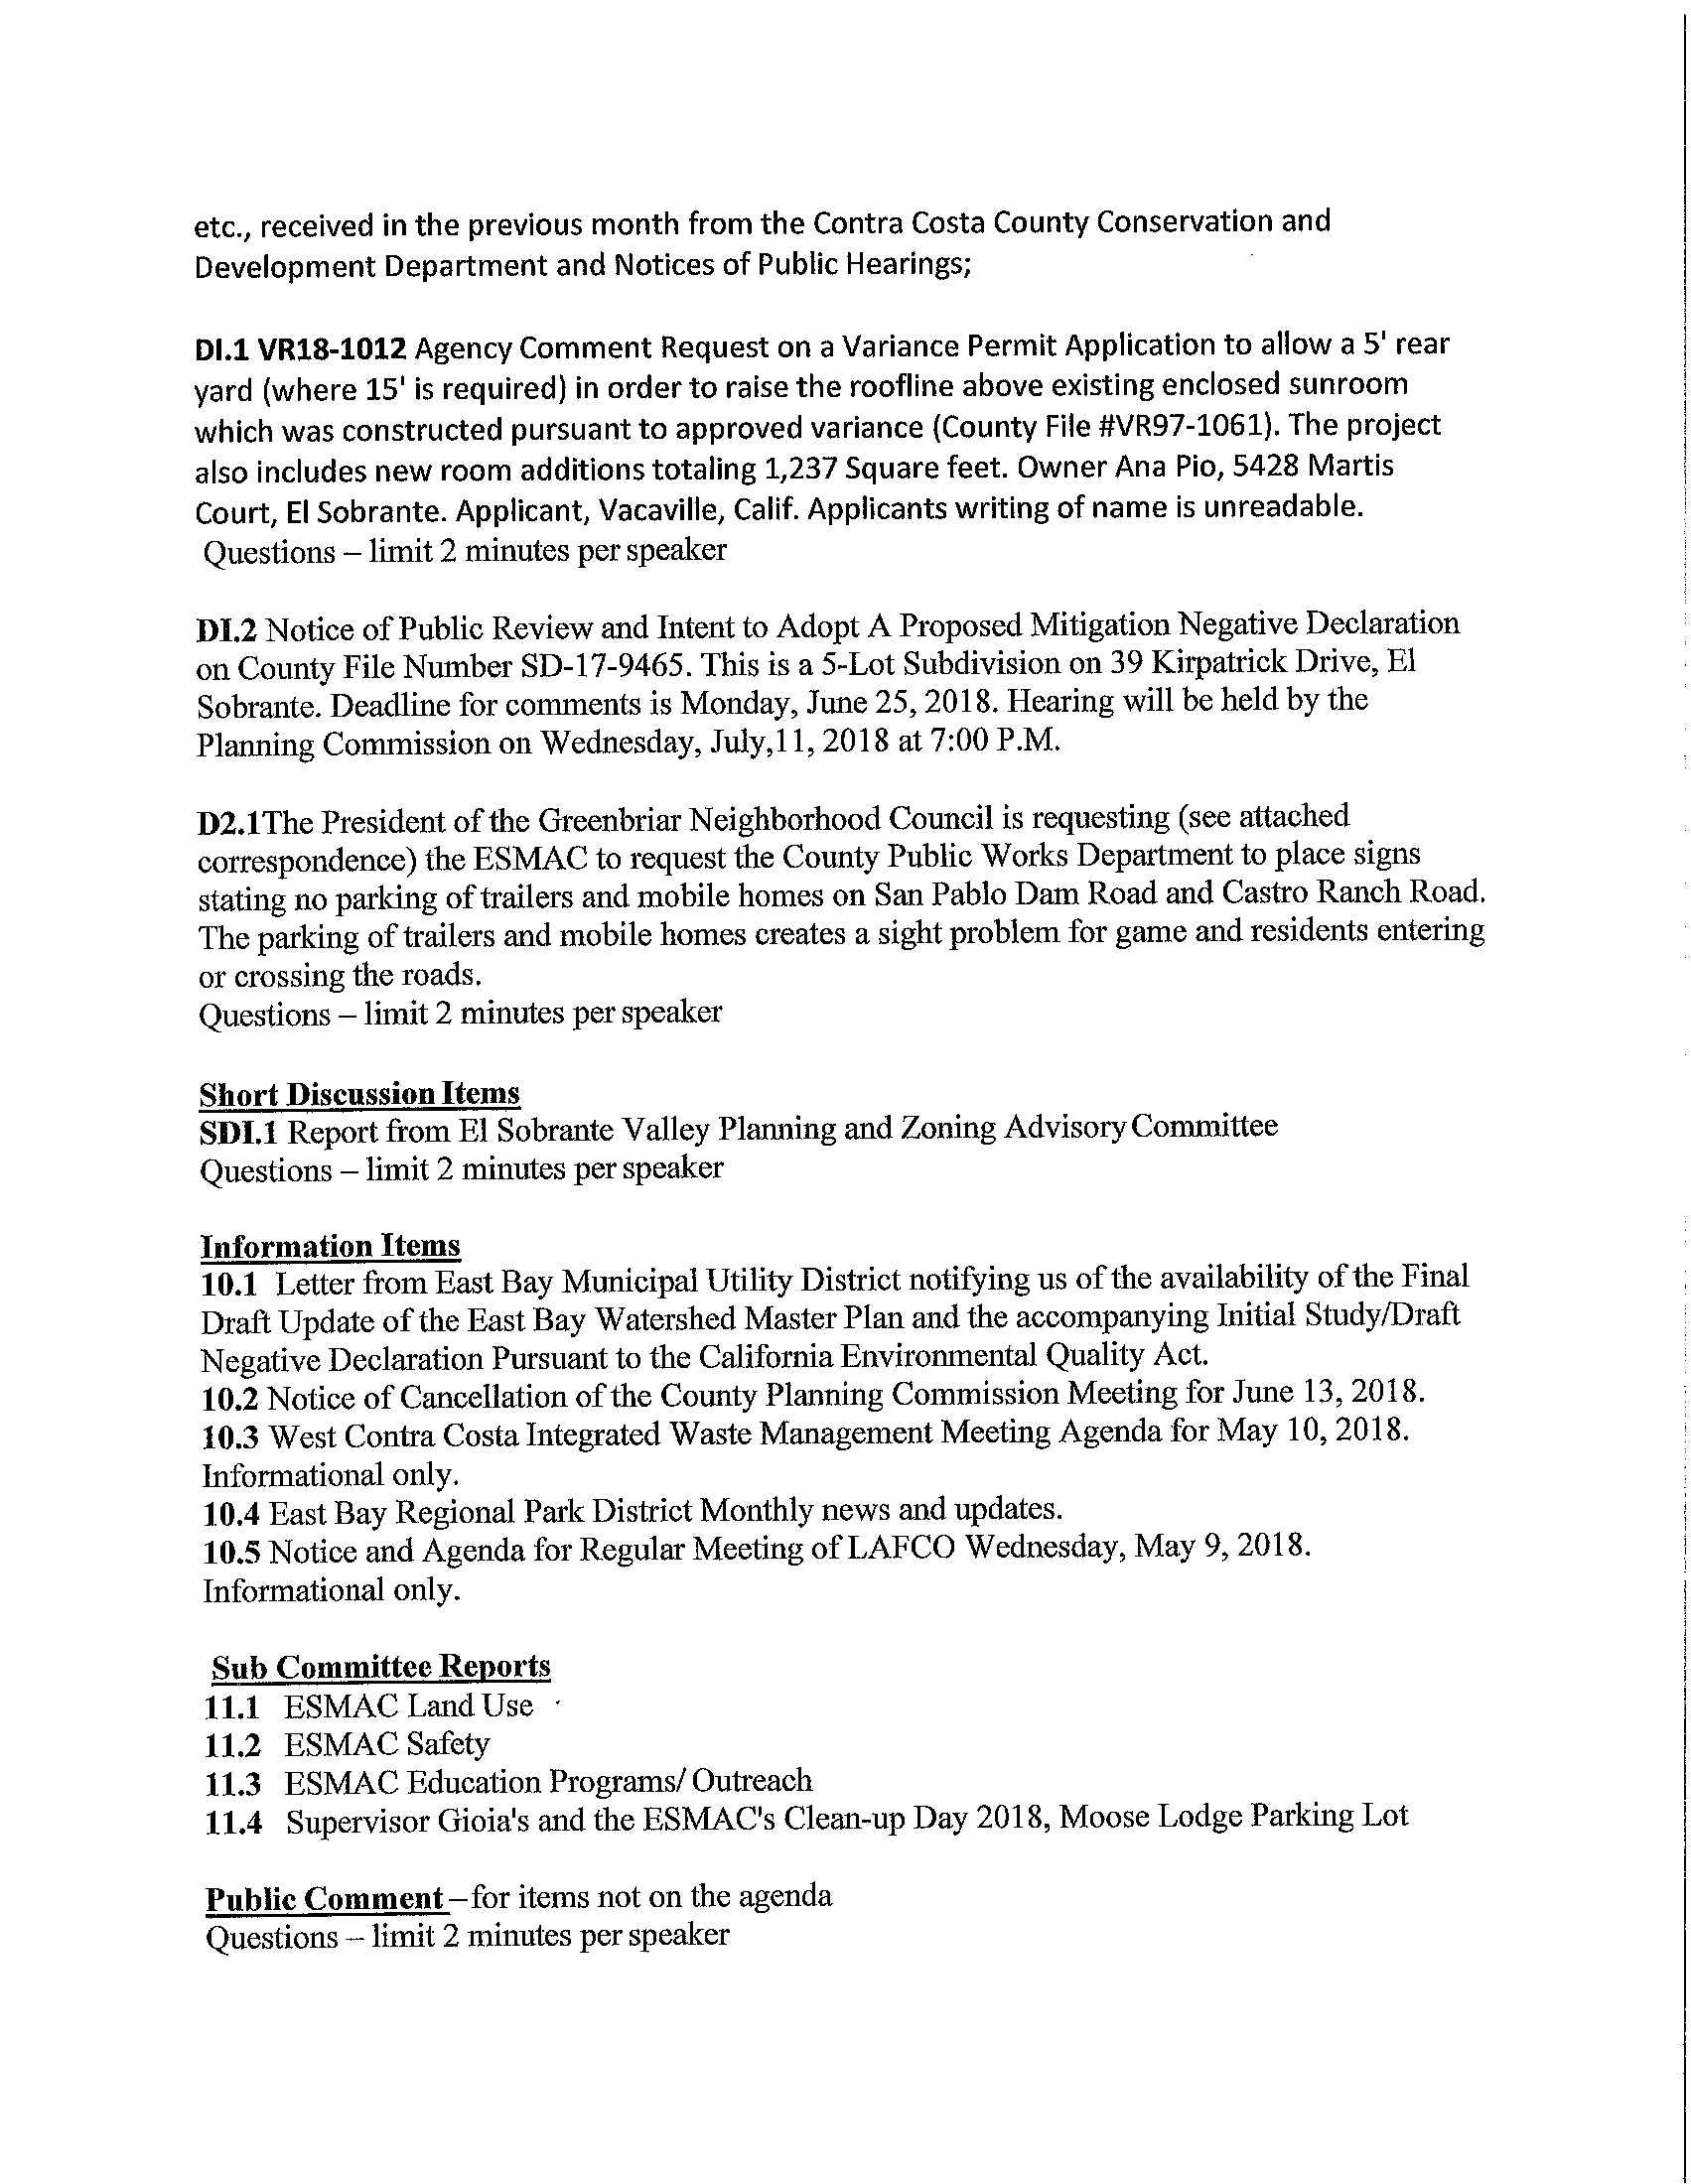 ESMAC Agenda 6.13.2018 (30 Pages)_2.jpg